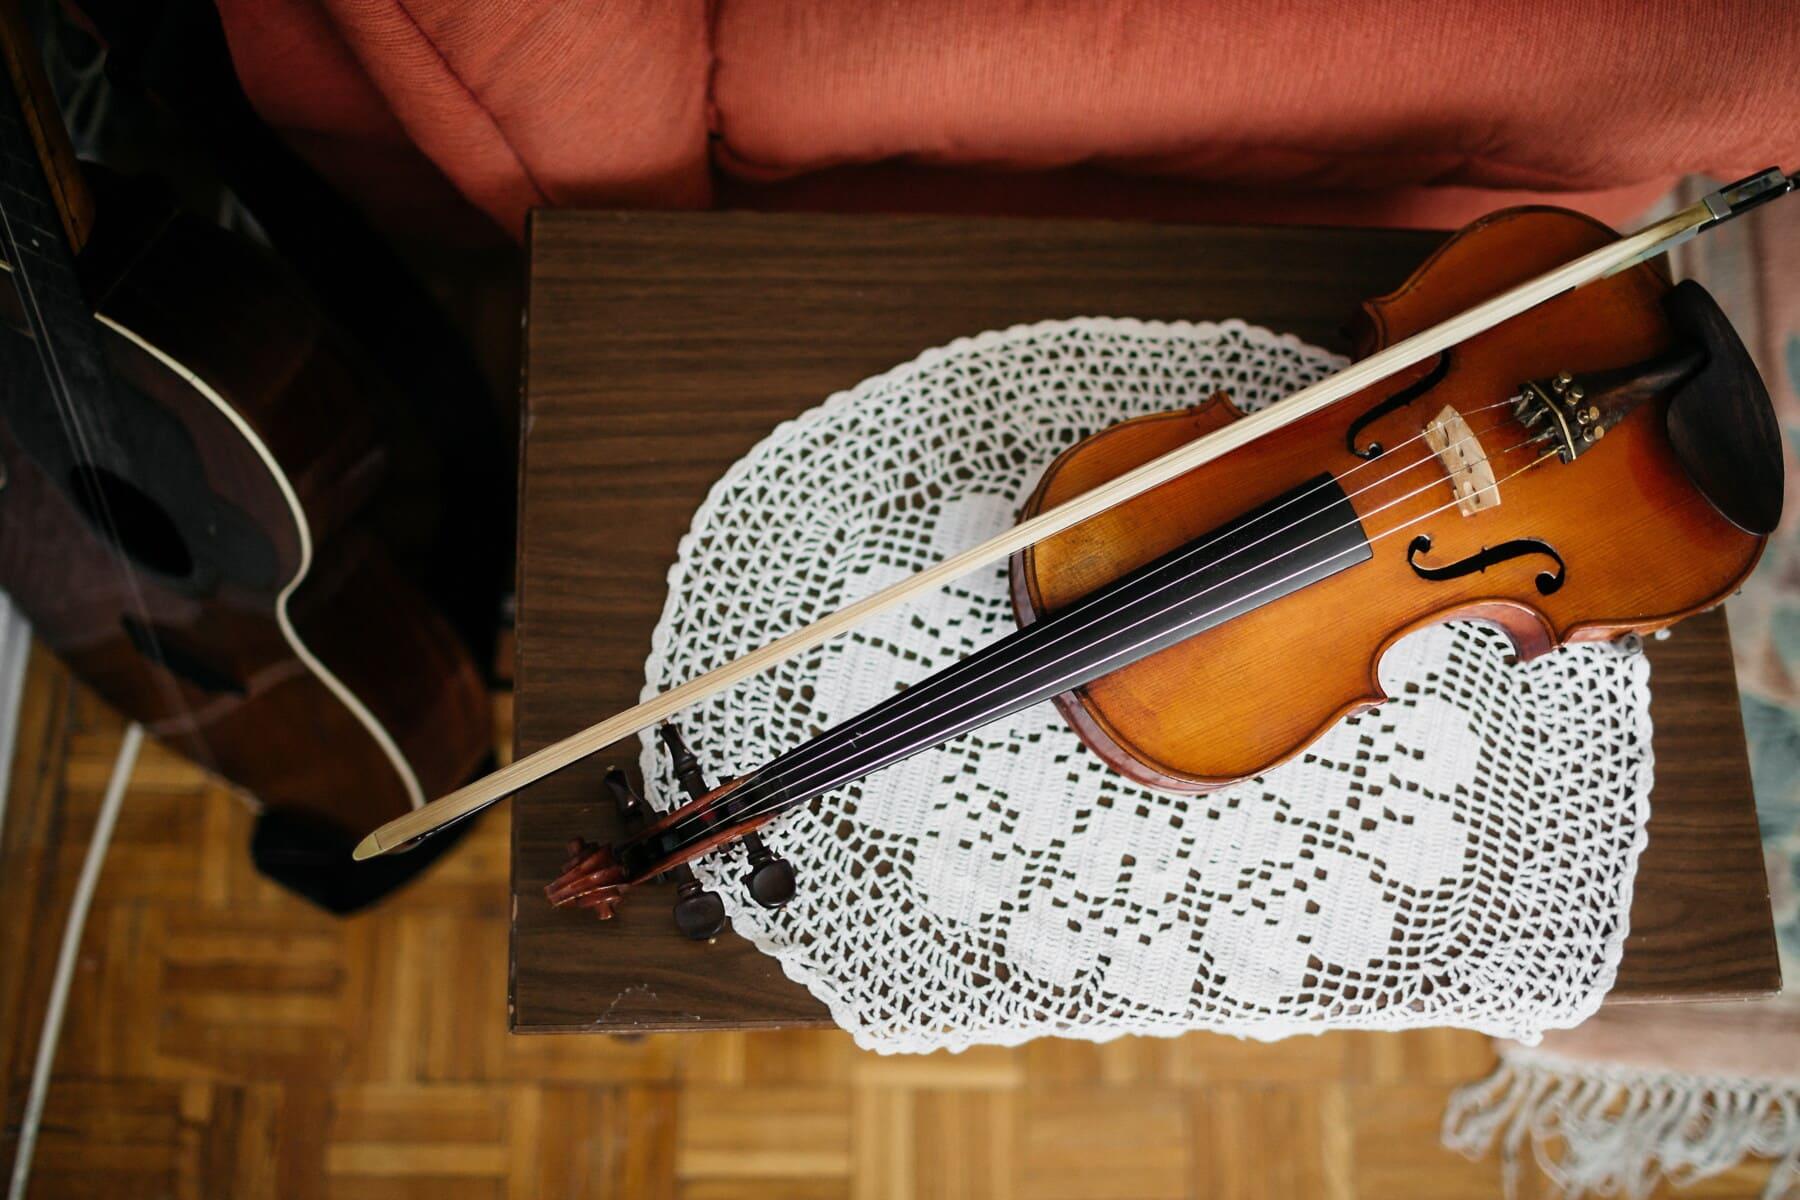 violin, vintage, old, music, wood, classic, instrument, musician, skill, art